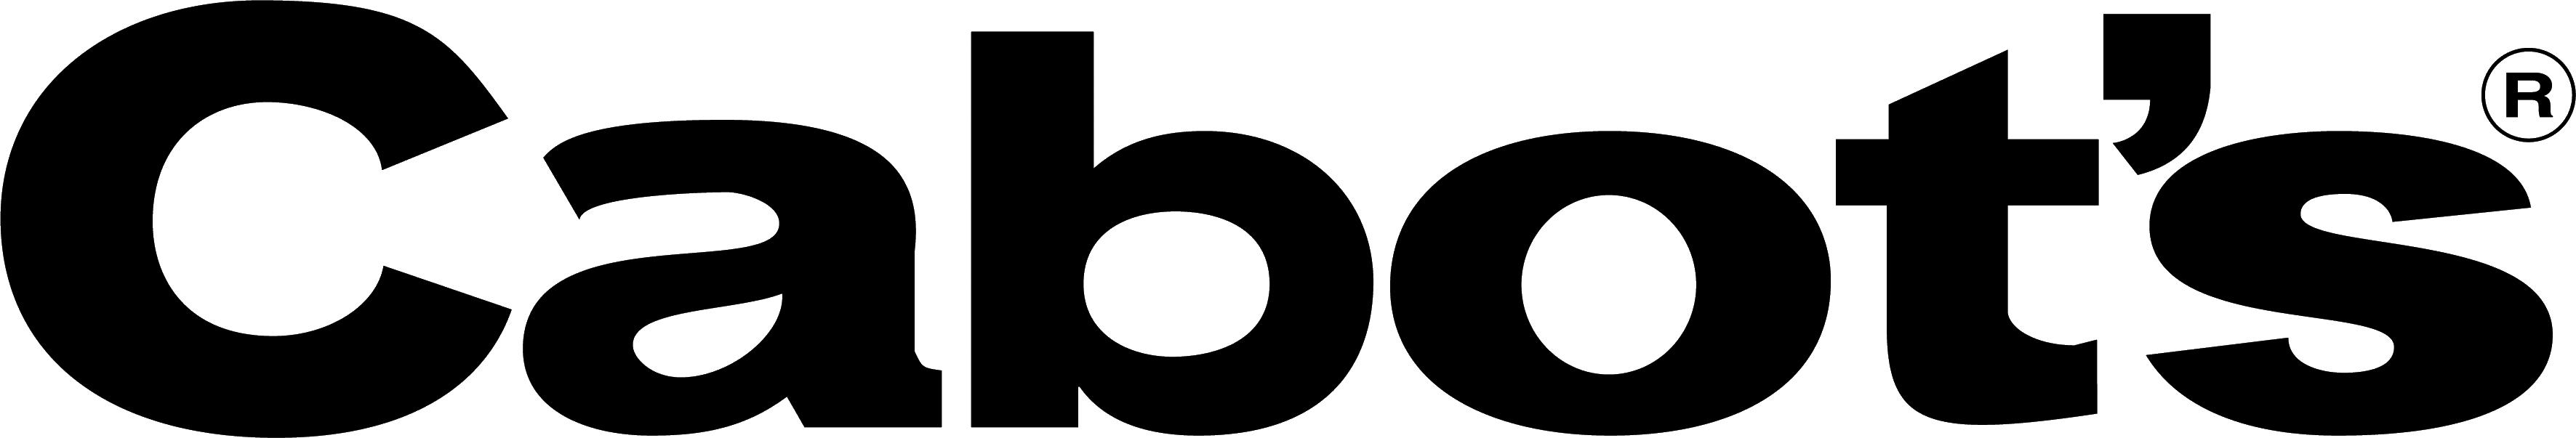 Cabot's logo